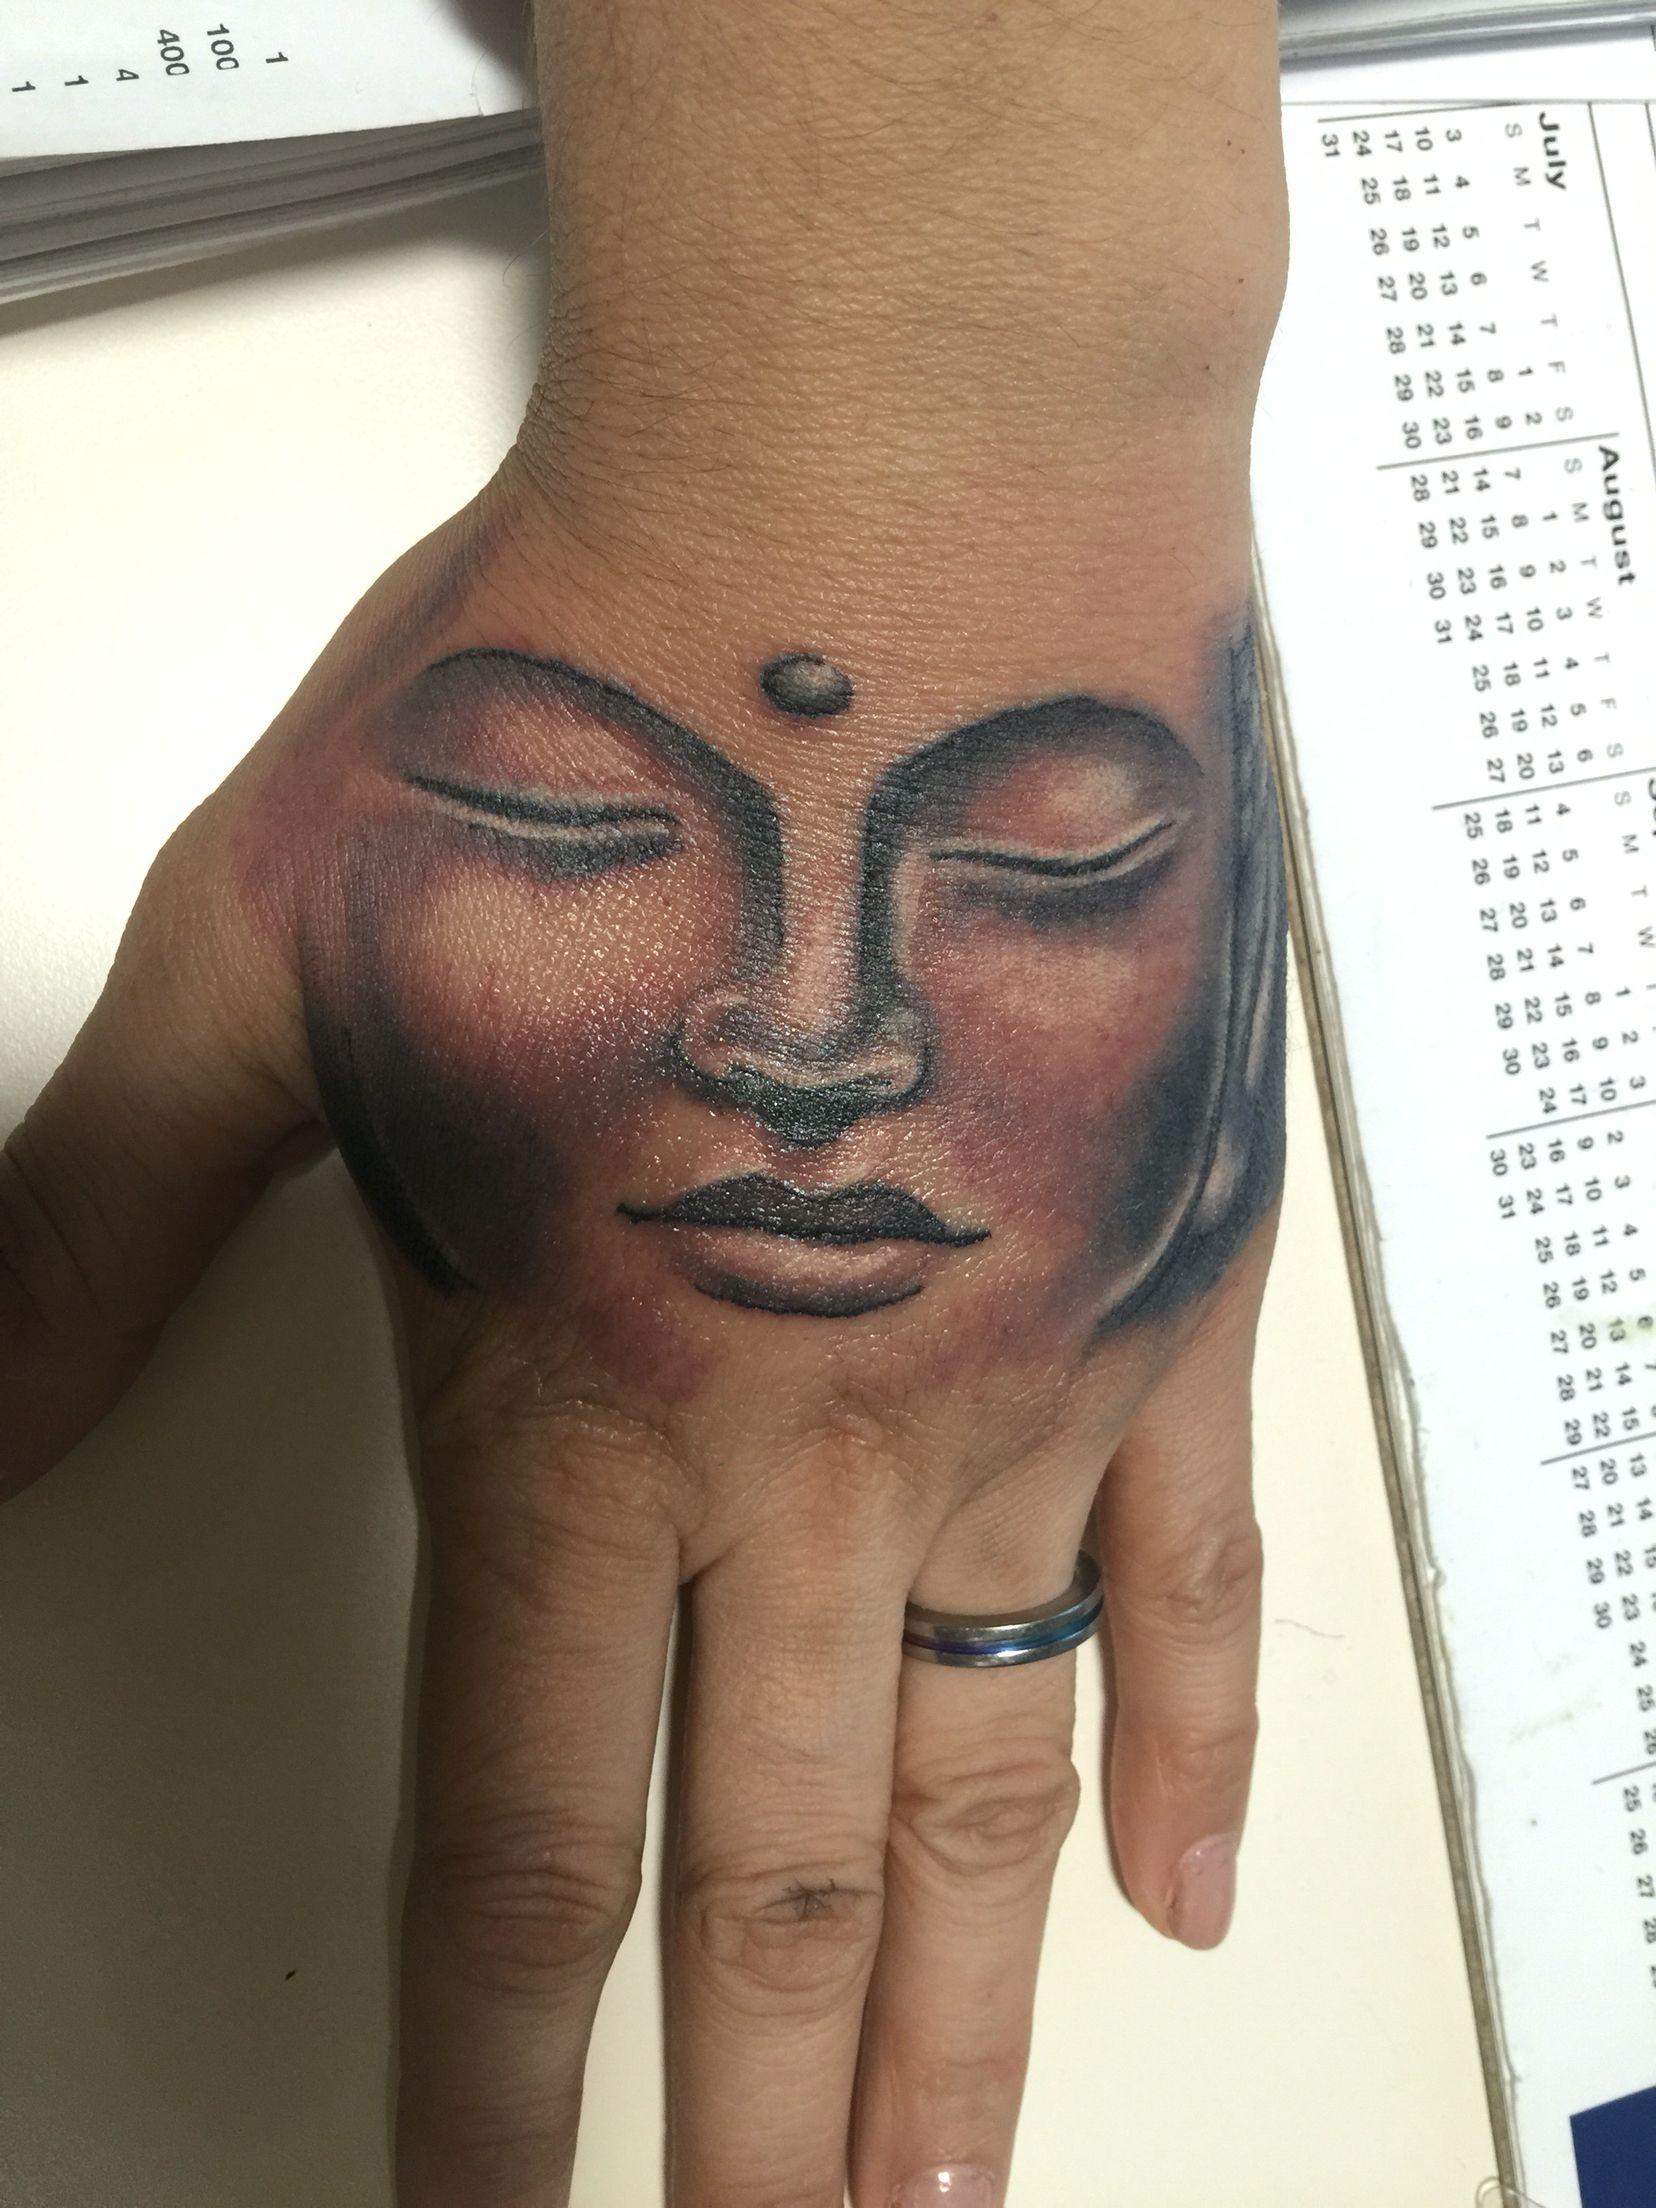 Buddha Hand Tattoo By Snake Eyes In Williamsburg Brooklyn B52 Hand Tattoos For Girls Hand Tattoos Tattoos